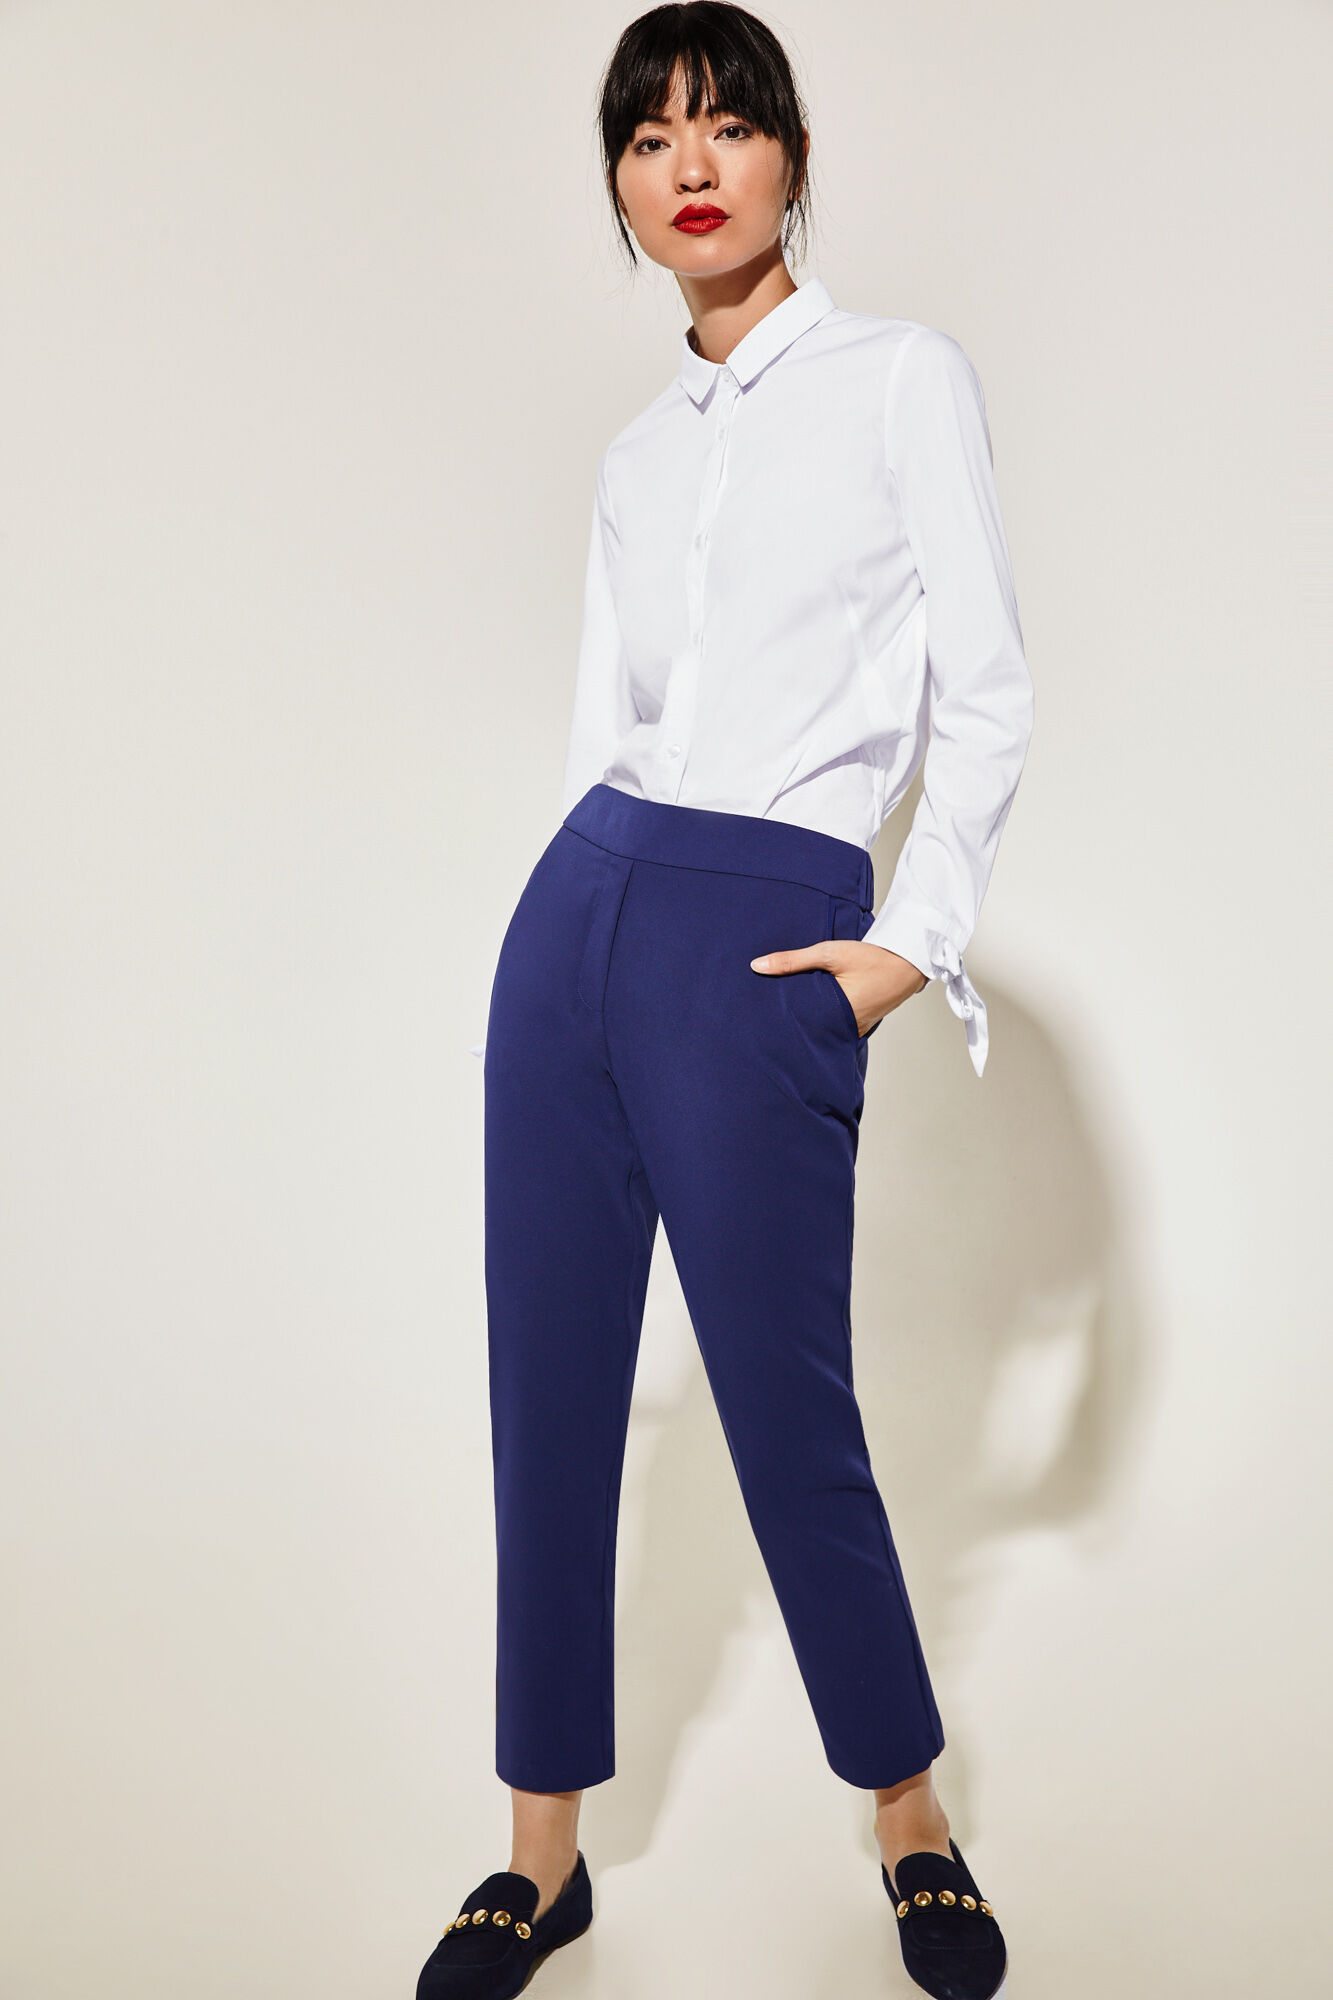 pantalones mujer de pantalones pantalones cortefiel de cortefiel fluidos fluidos cortefiel mujer fluidos mujer de awOEqvrw